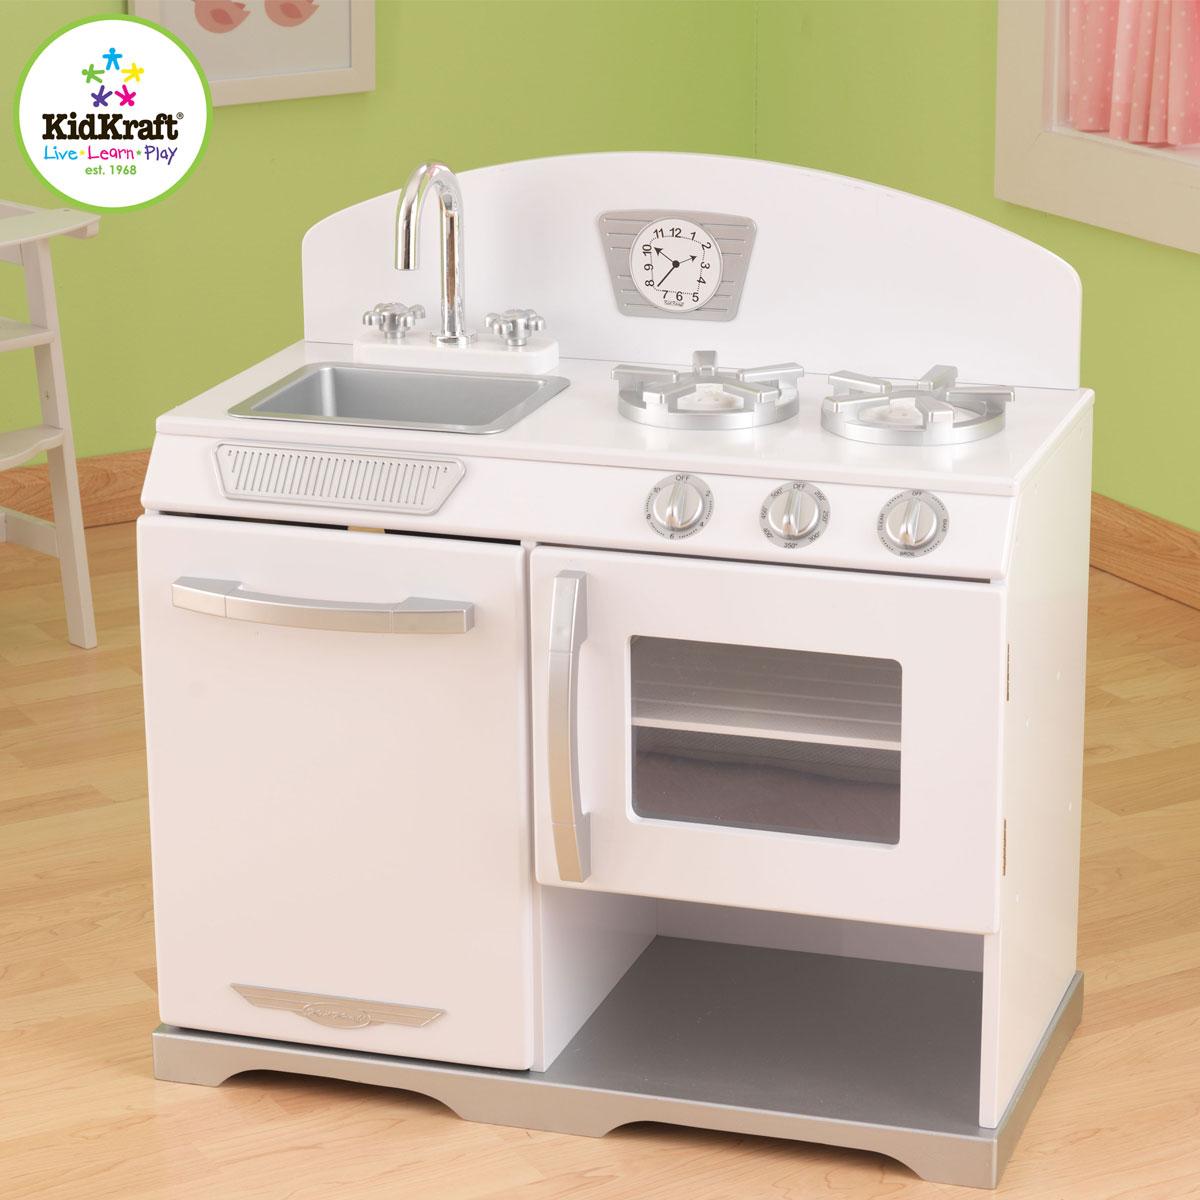 ... Kidkraft Retro Kitchen And Refrigerator Ideas Kidkraft Retro Kitchen